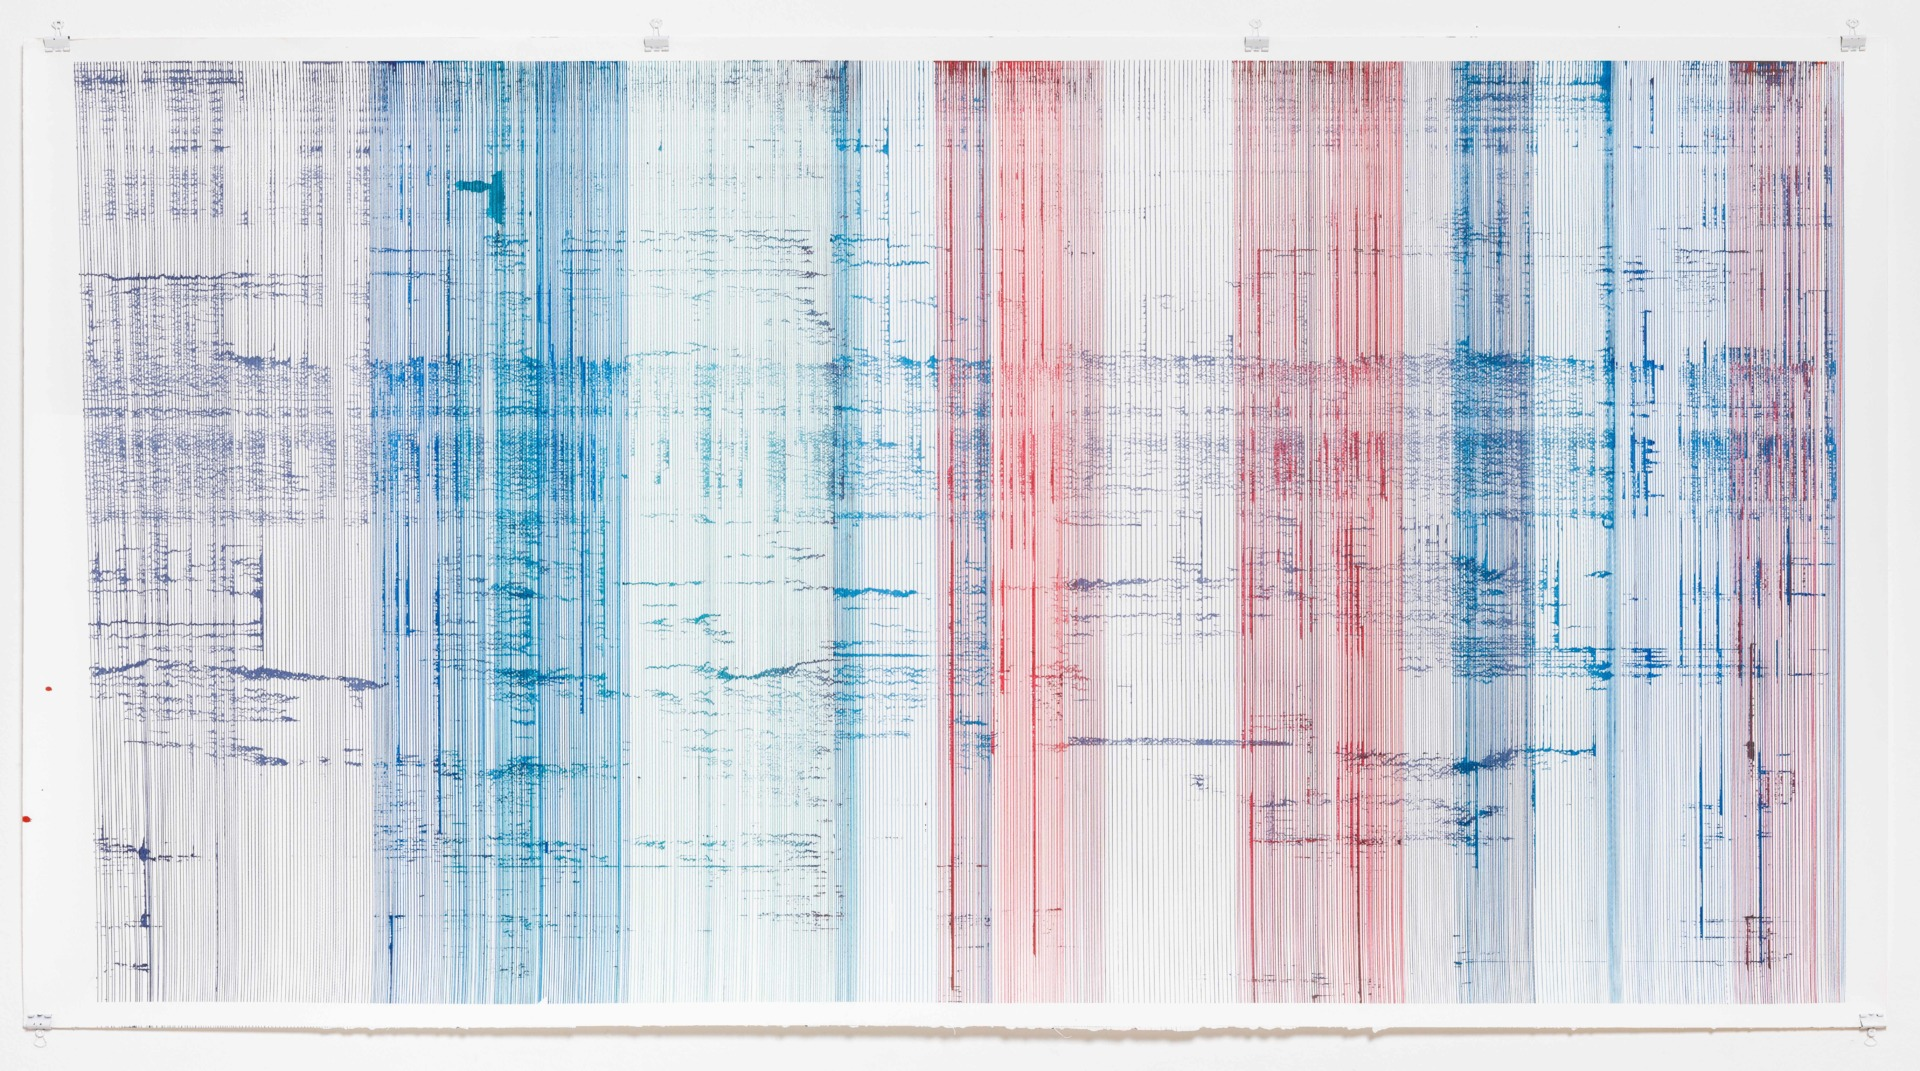 Op.116. ink on paper, 80x150 cm, 2016